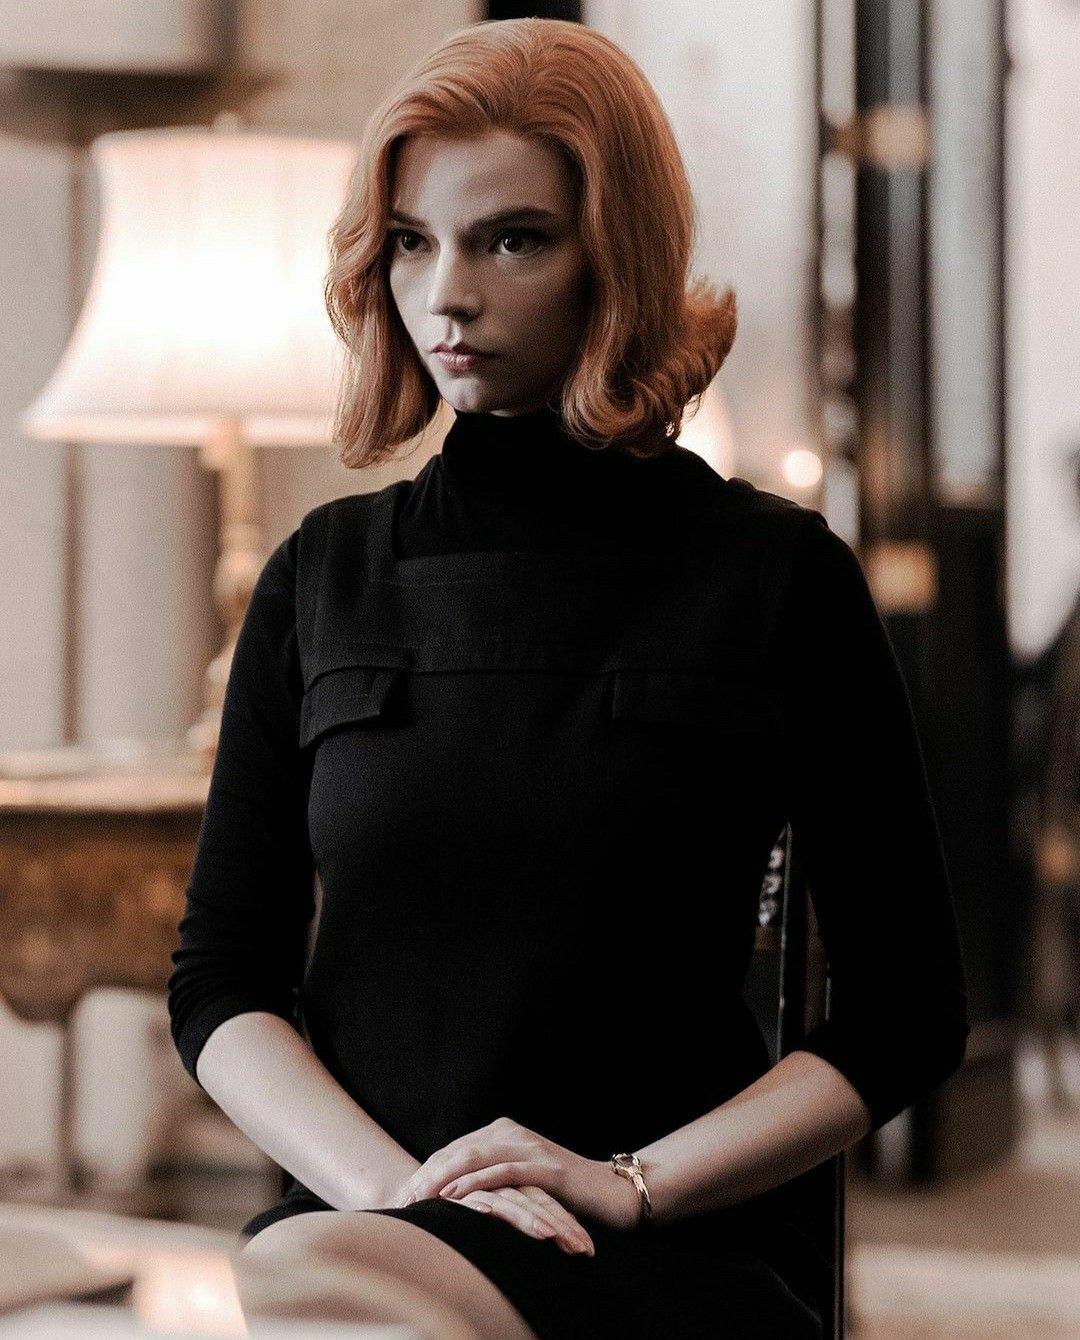 Mini Cutout Anya Taylor Joy Black Suit